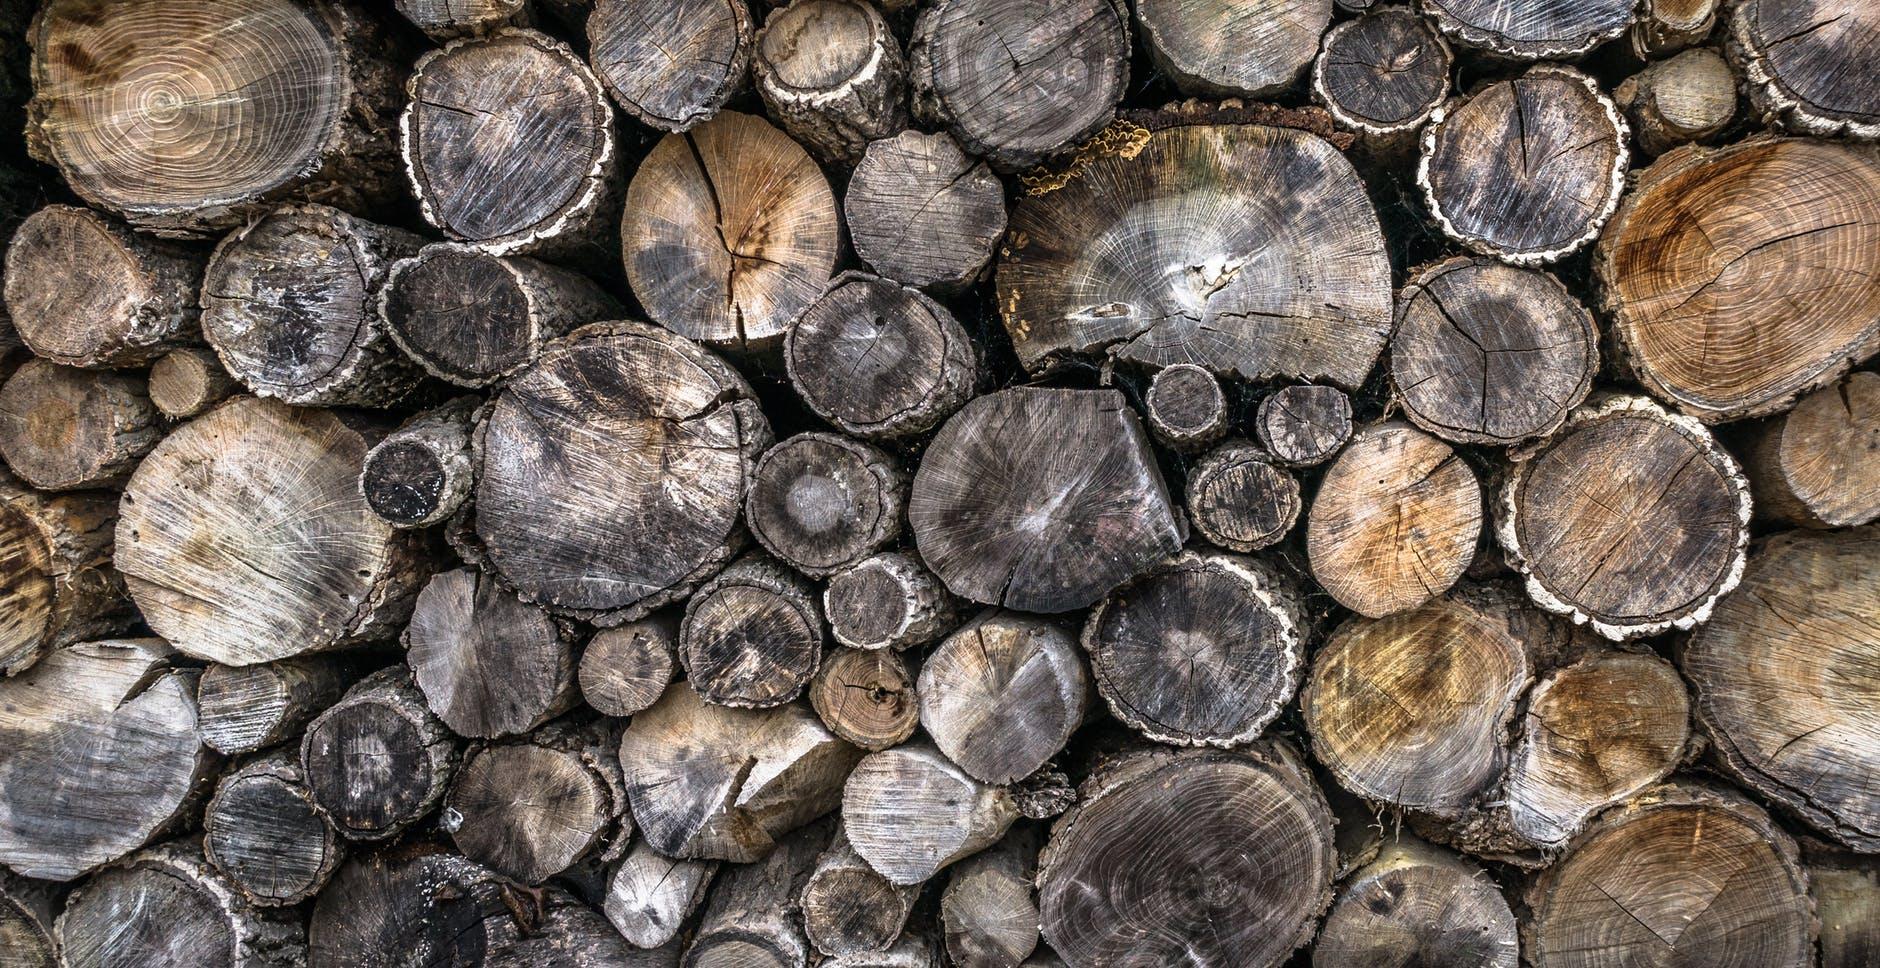 Common timber found in Australia